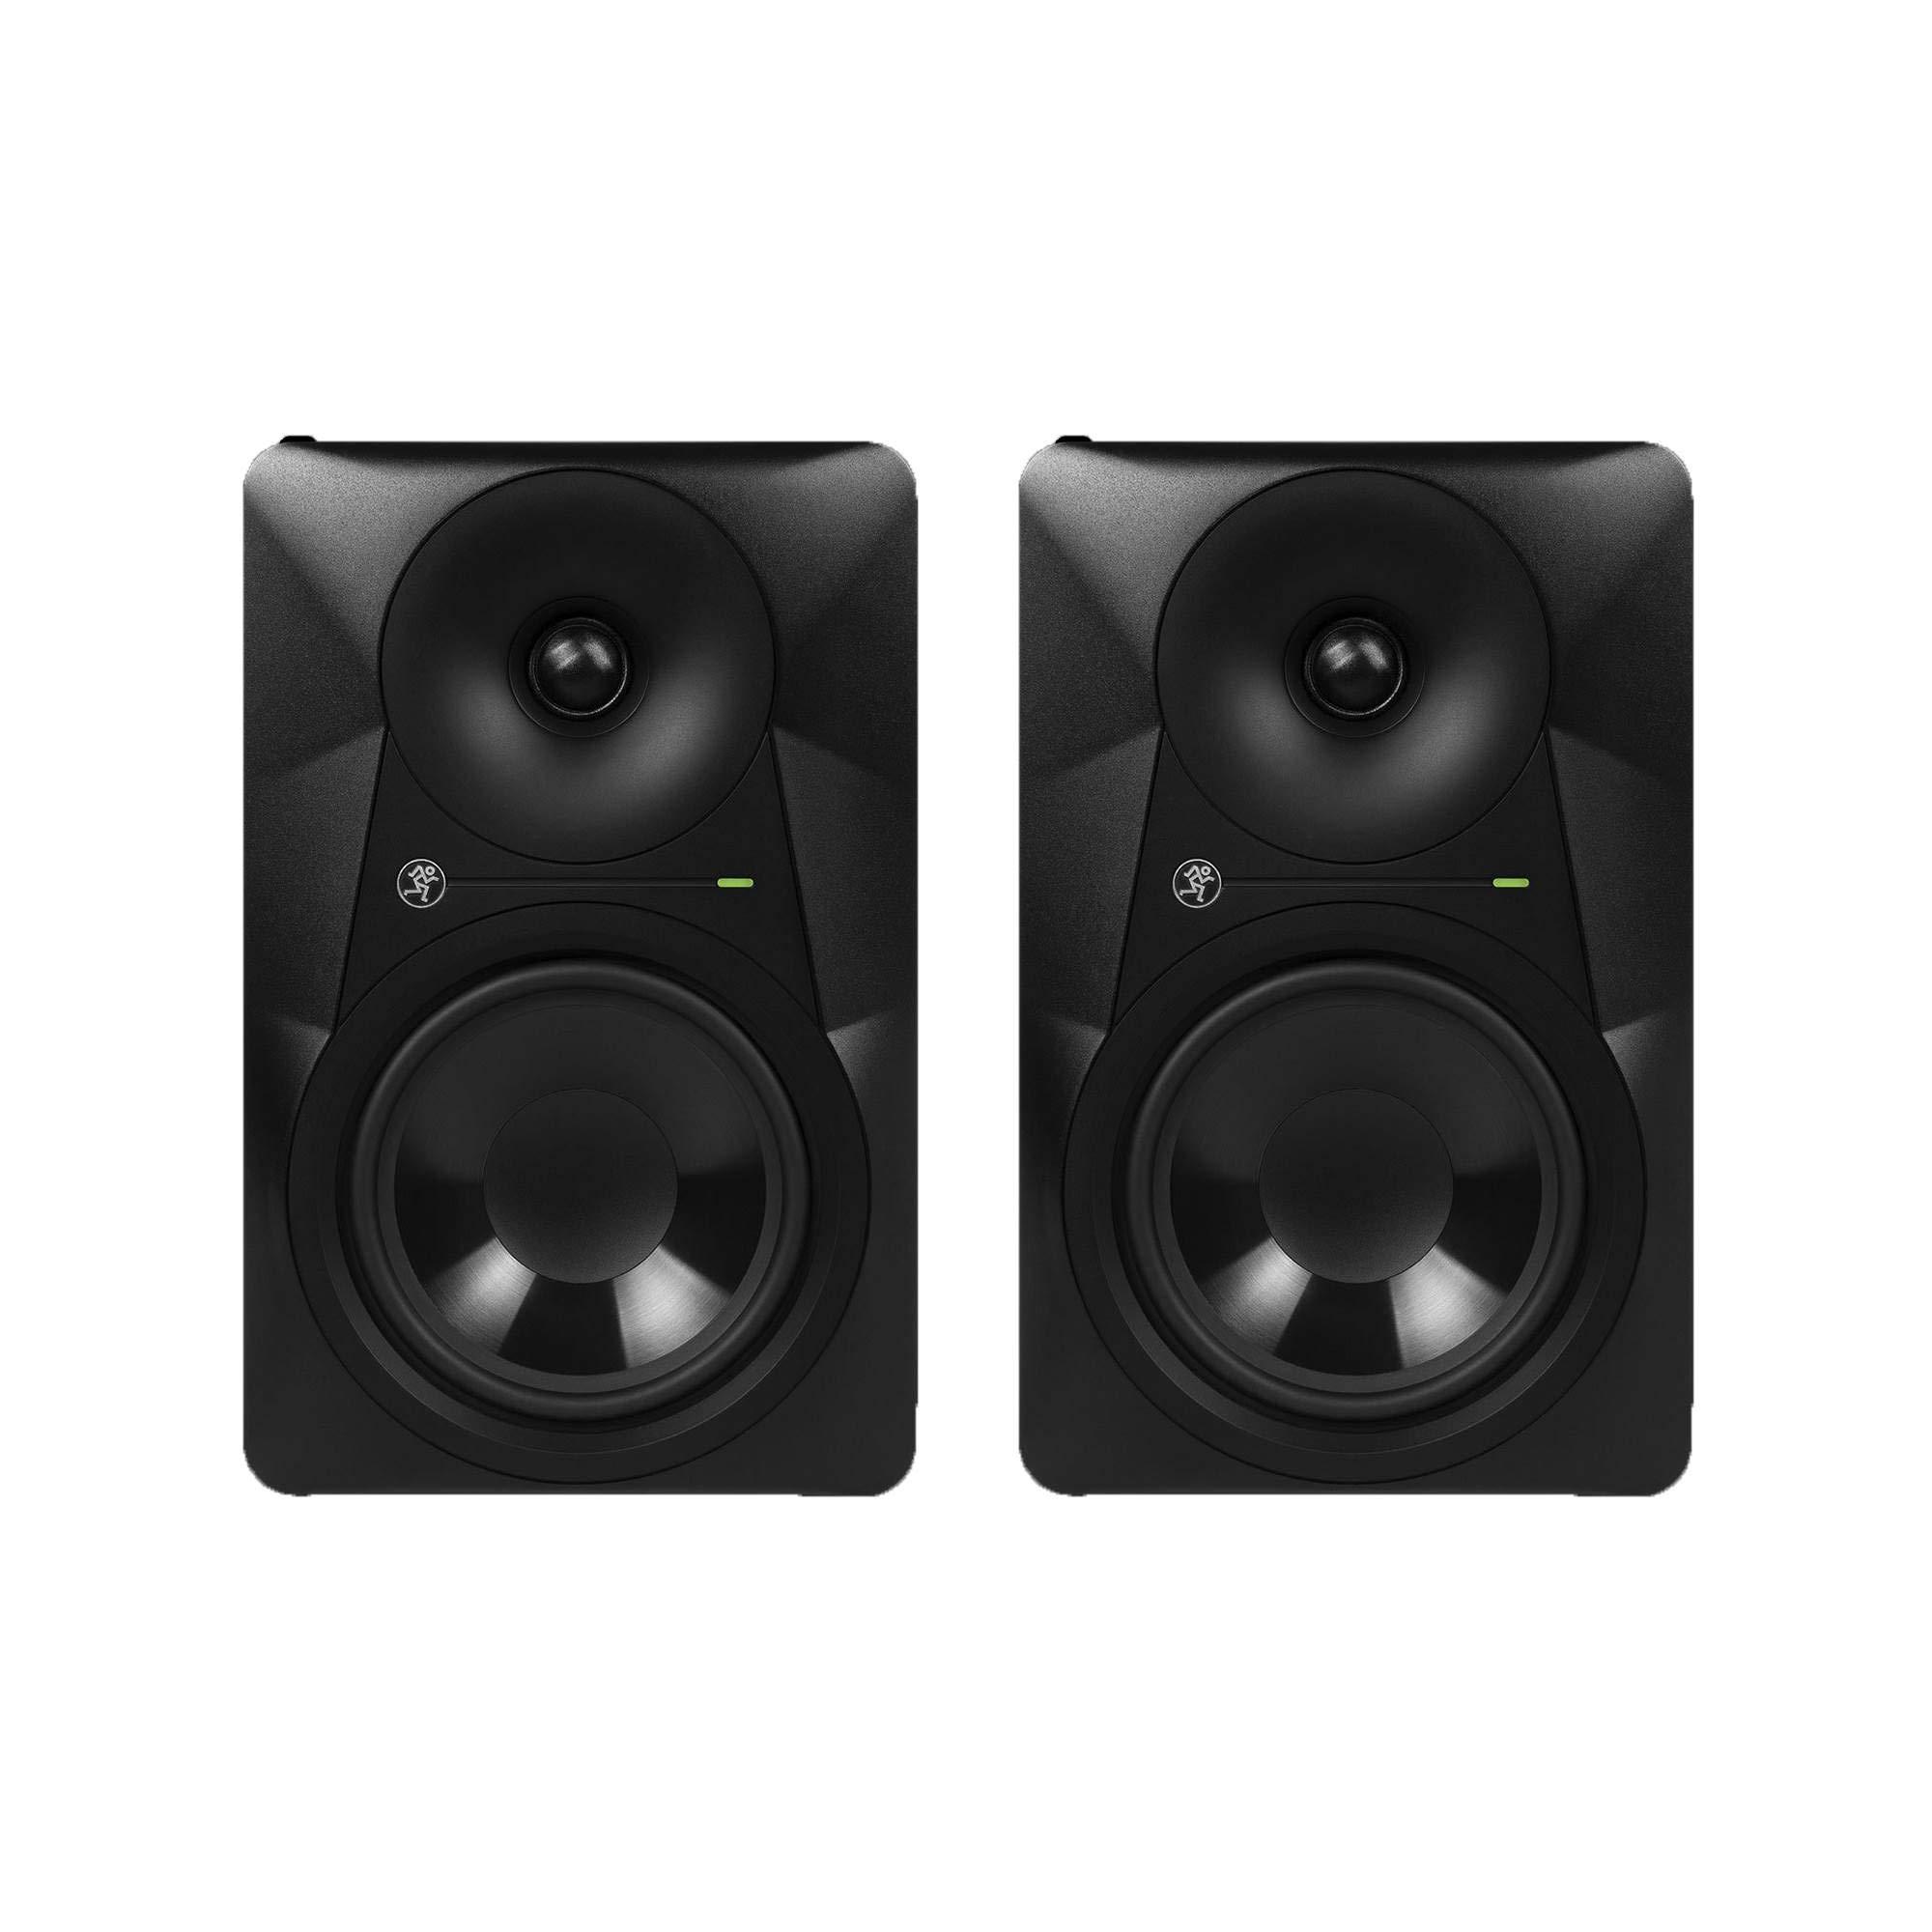 Mackie Acoustic Design 6.5 Inch 65 Watt Mixing Powered Studio Monitor (2 Pack) by Mackie